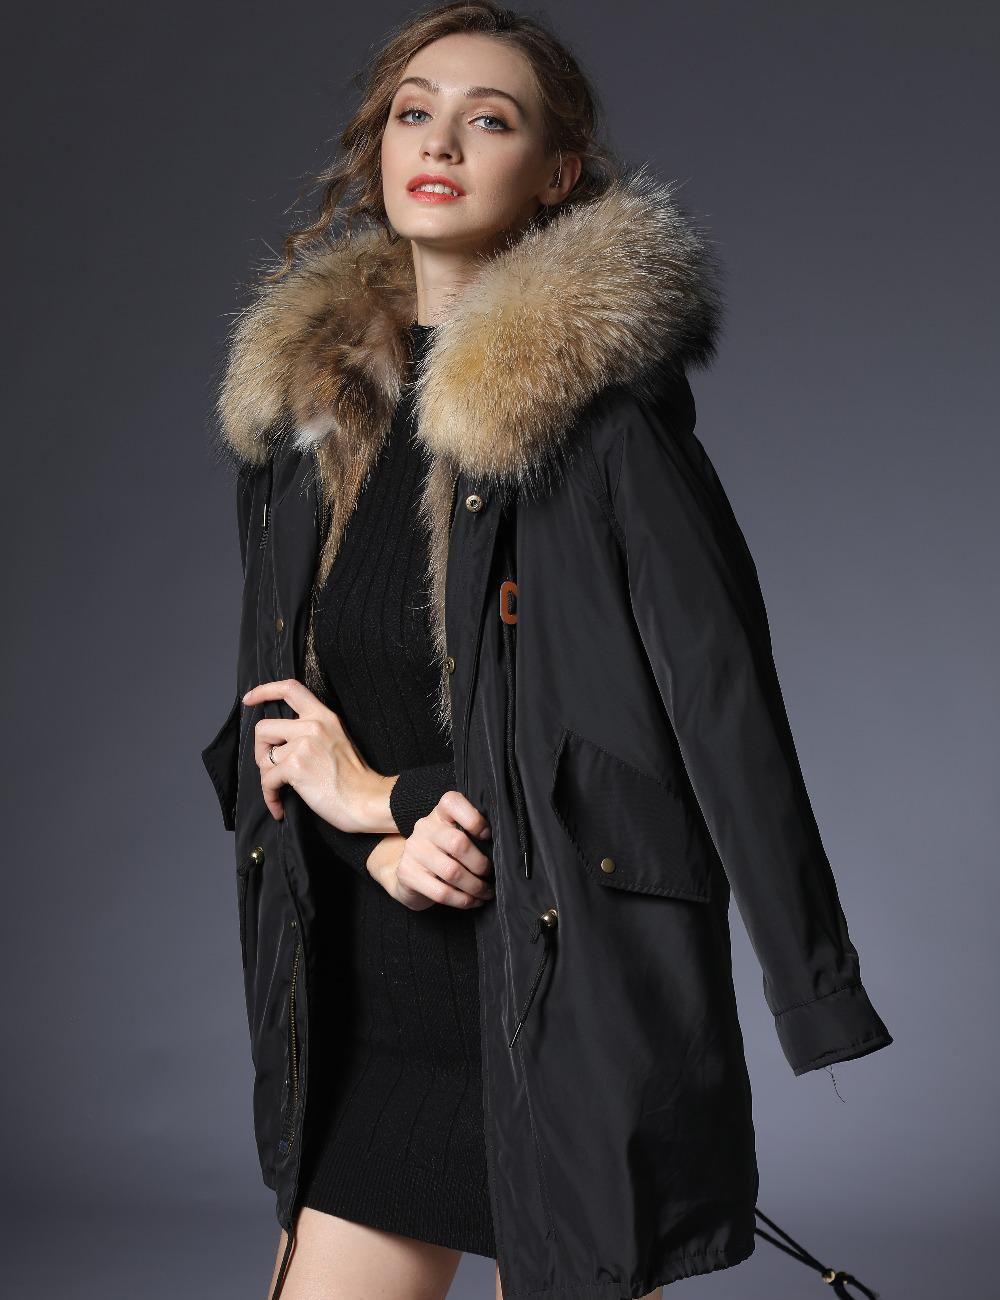 2018 parka woman winter jacket parkas women long real fur coat big raccoon  fur collar hooded parkas thick outerwear stree style.